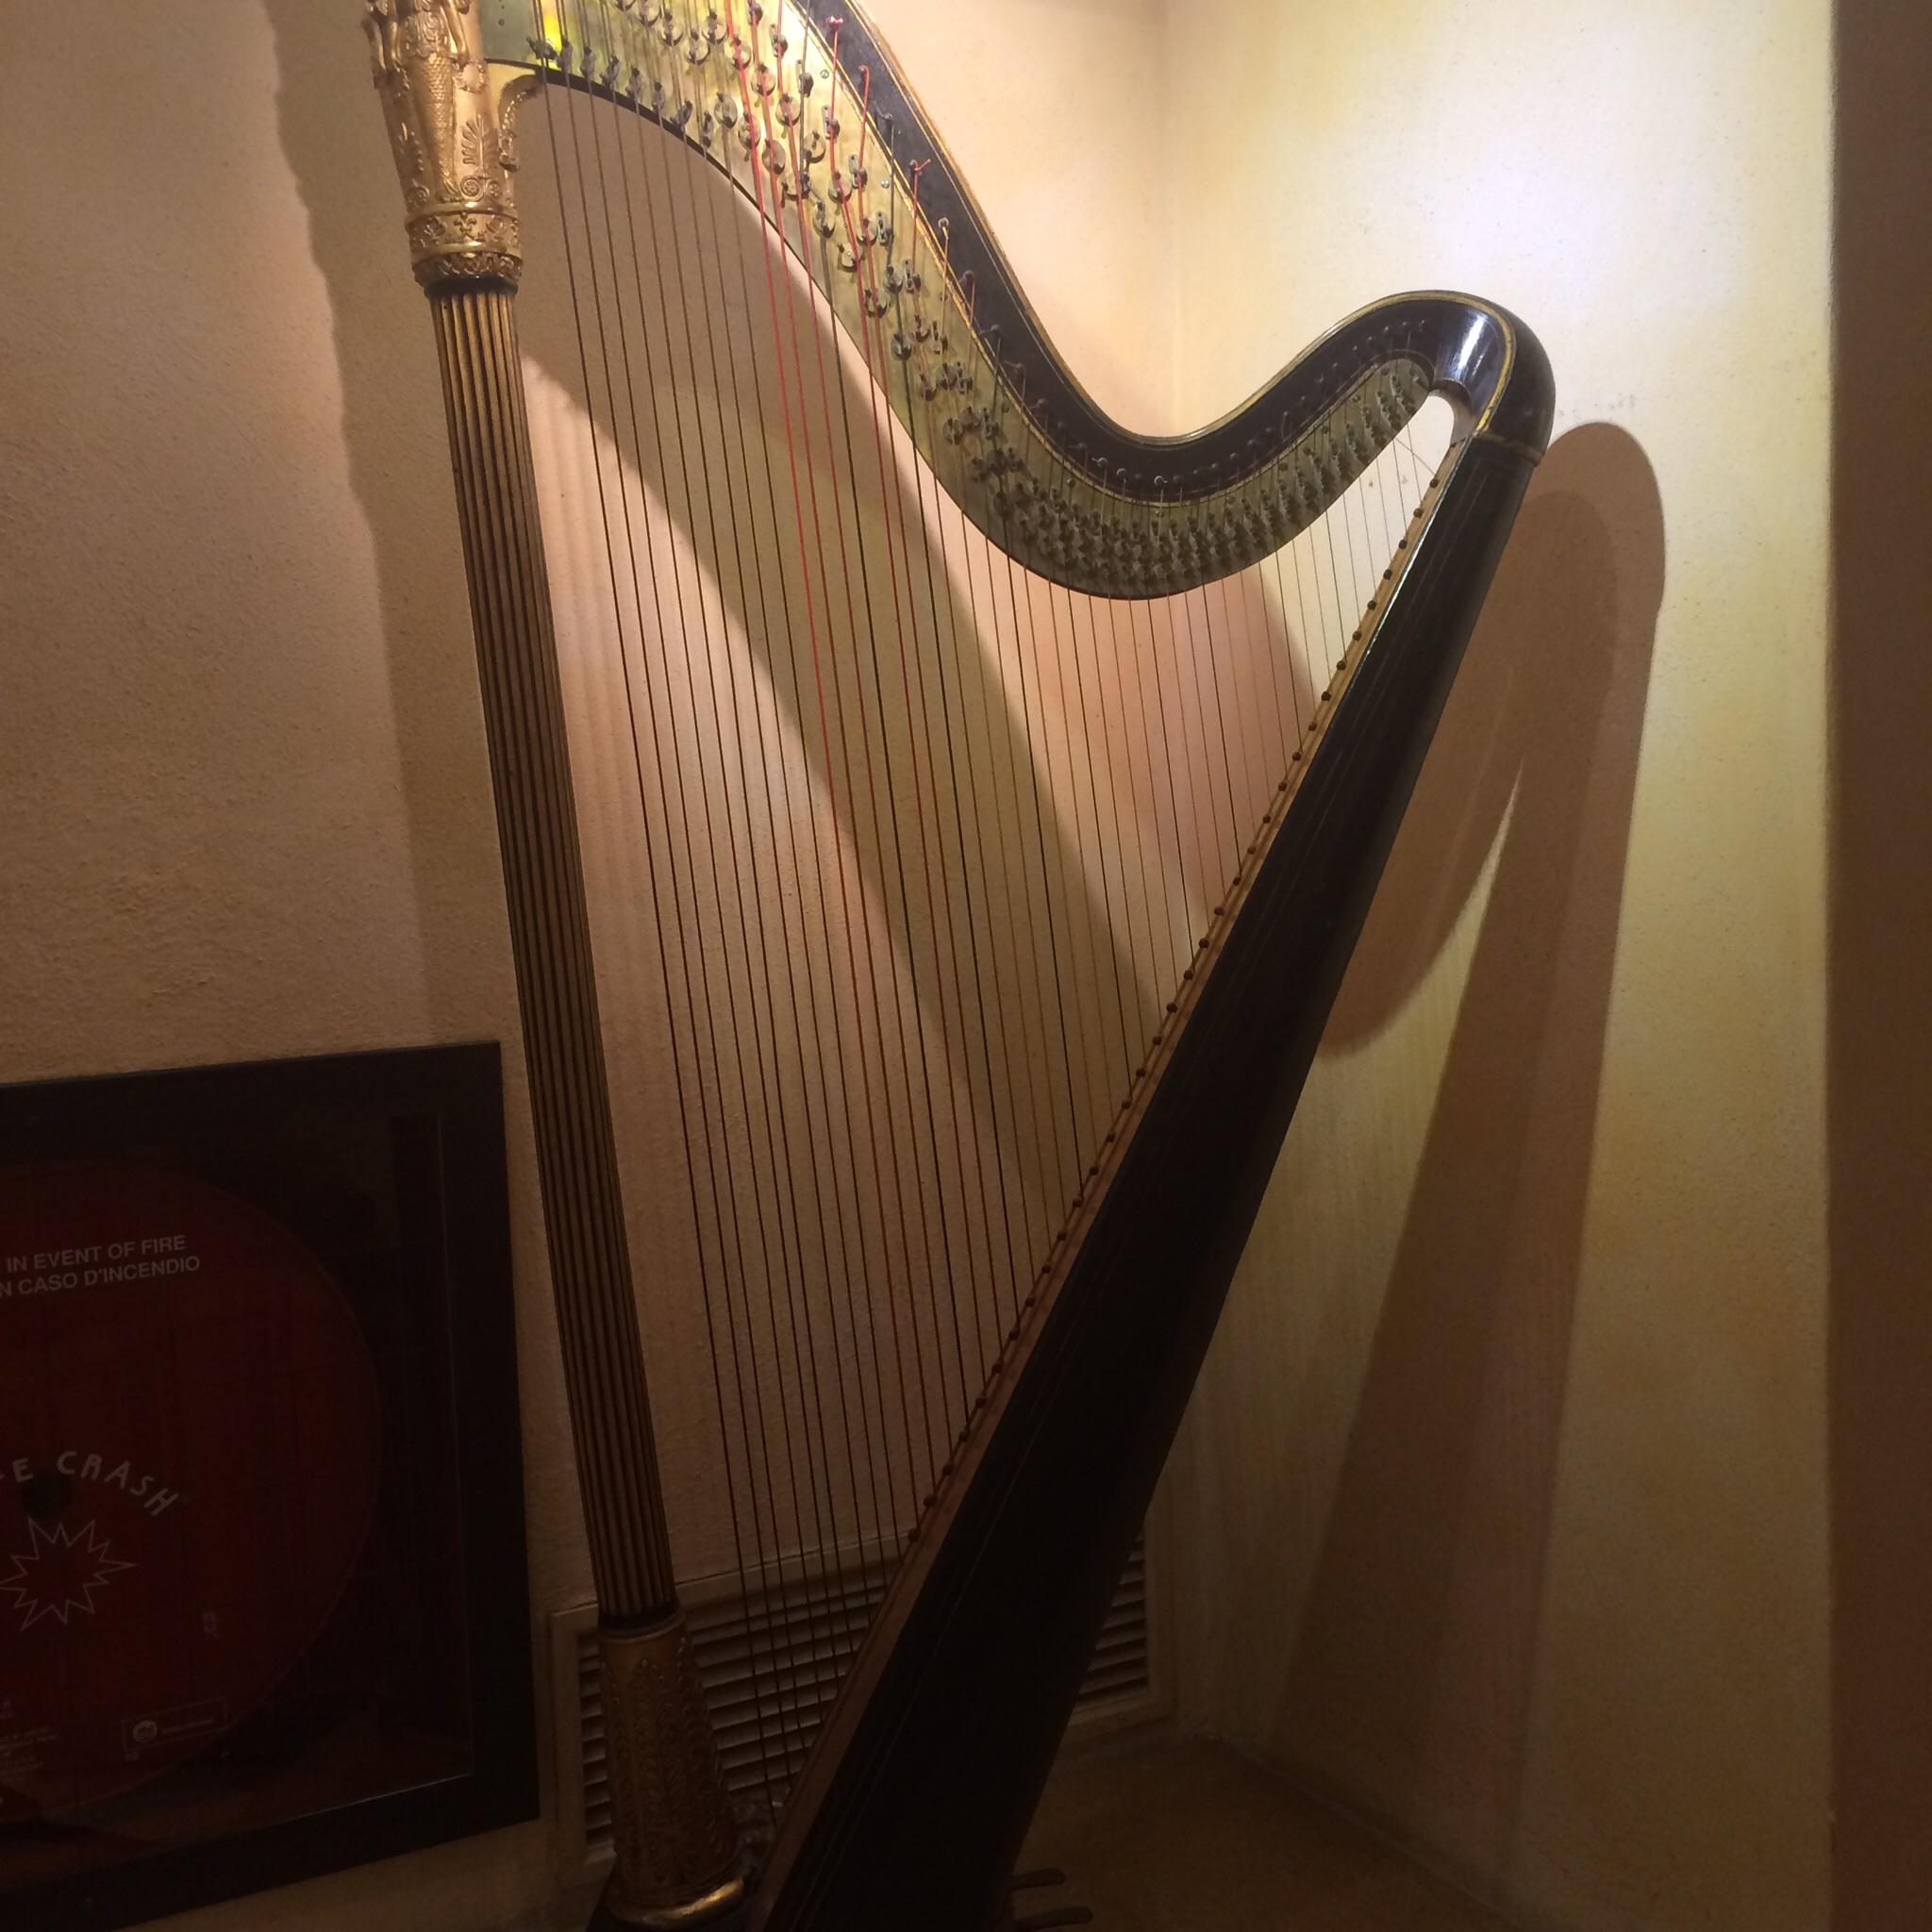 The hotel harp.